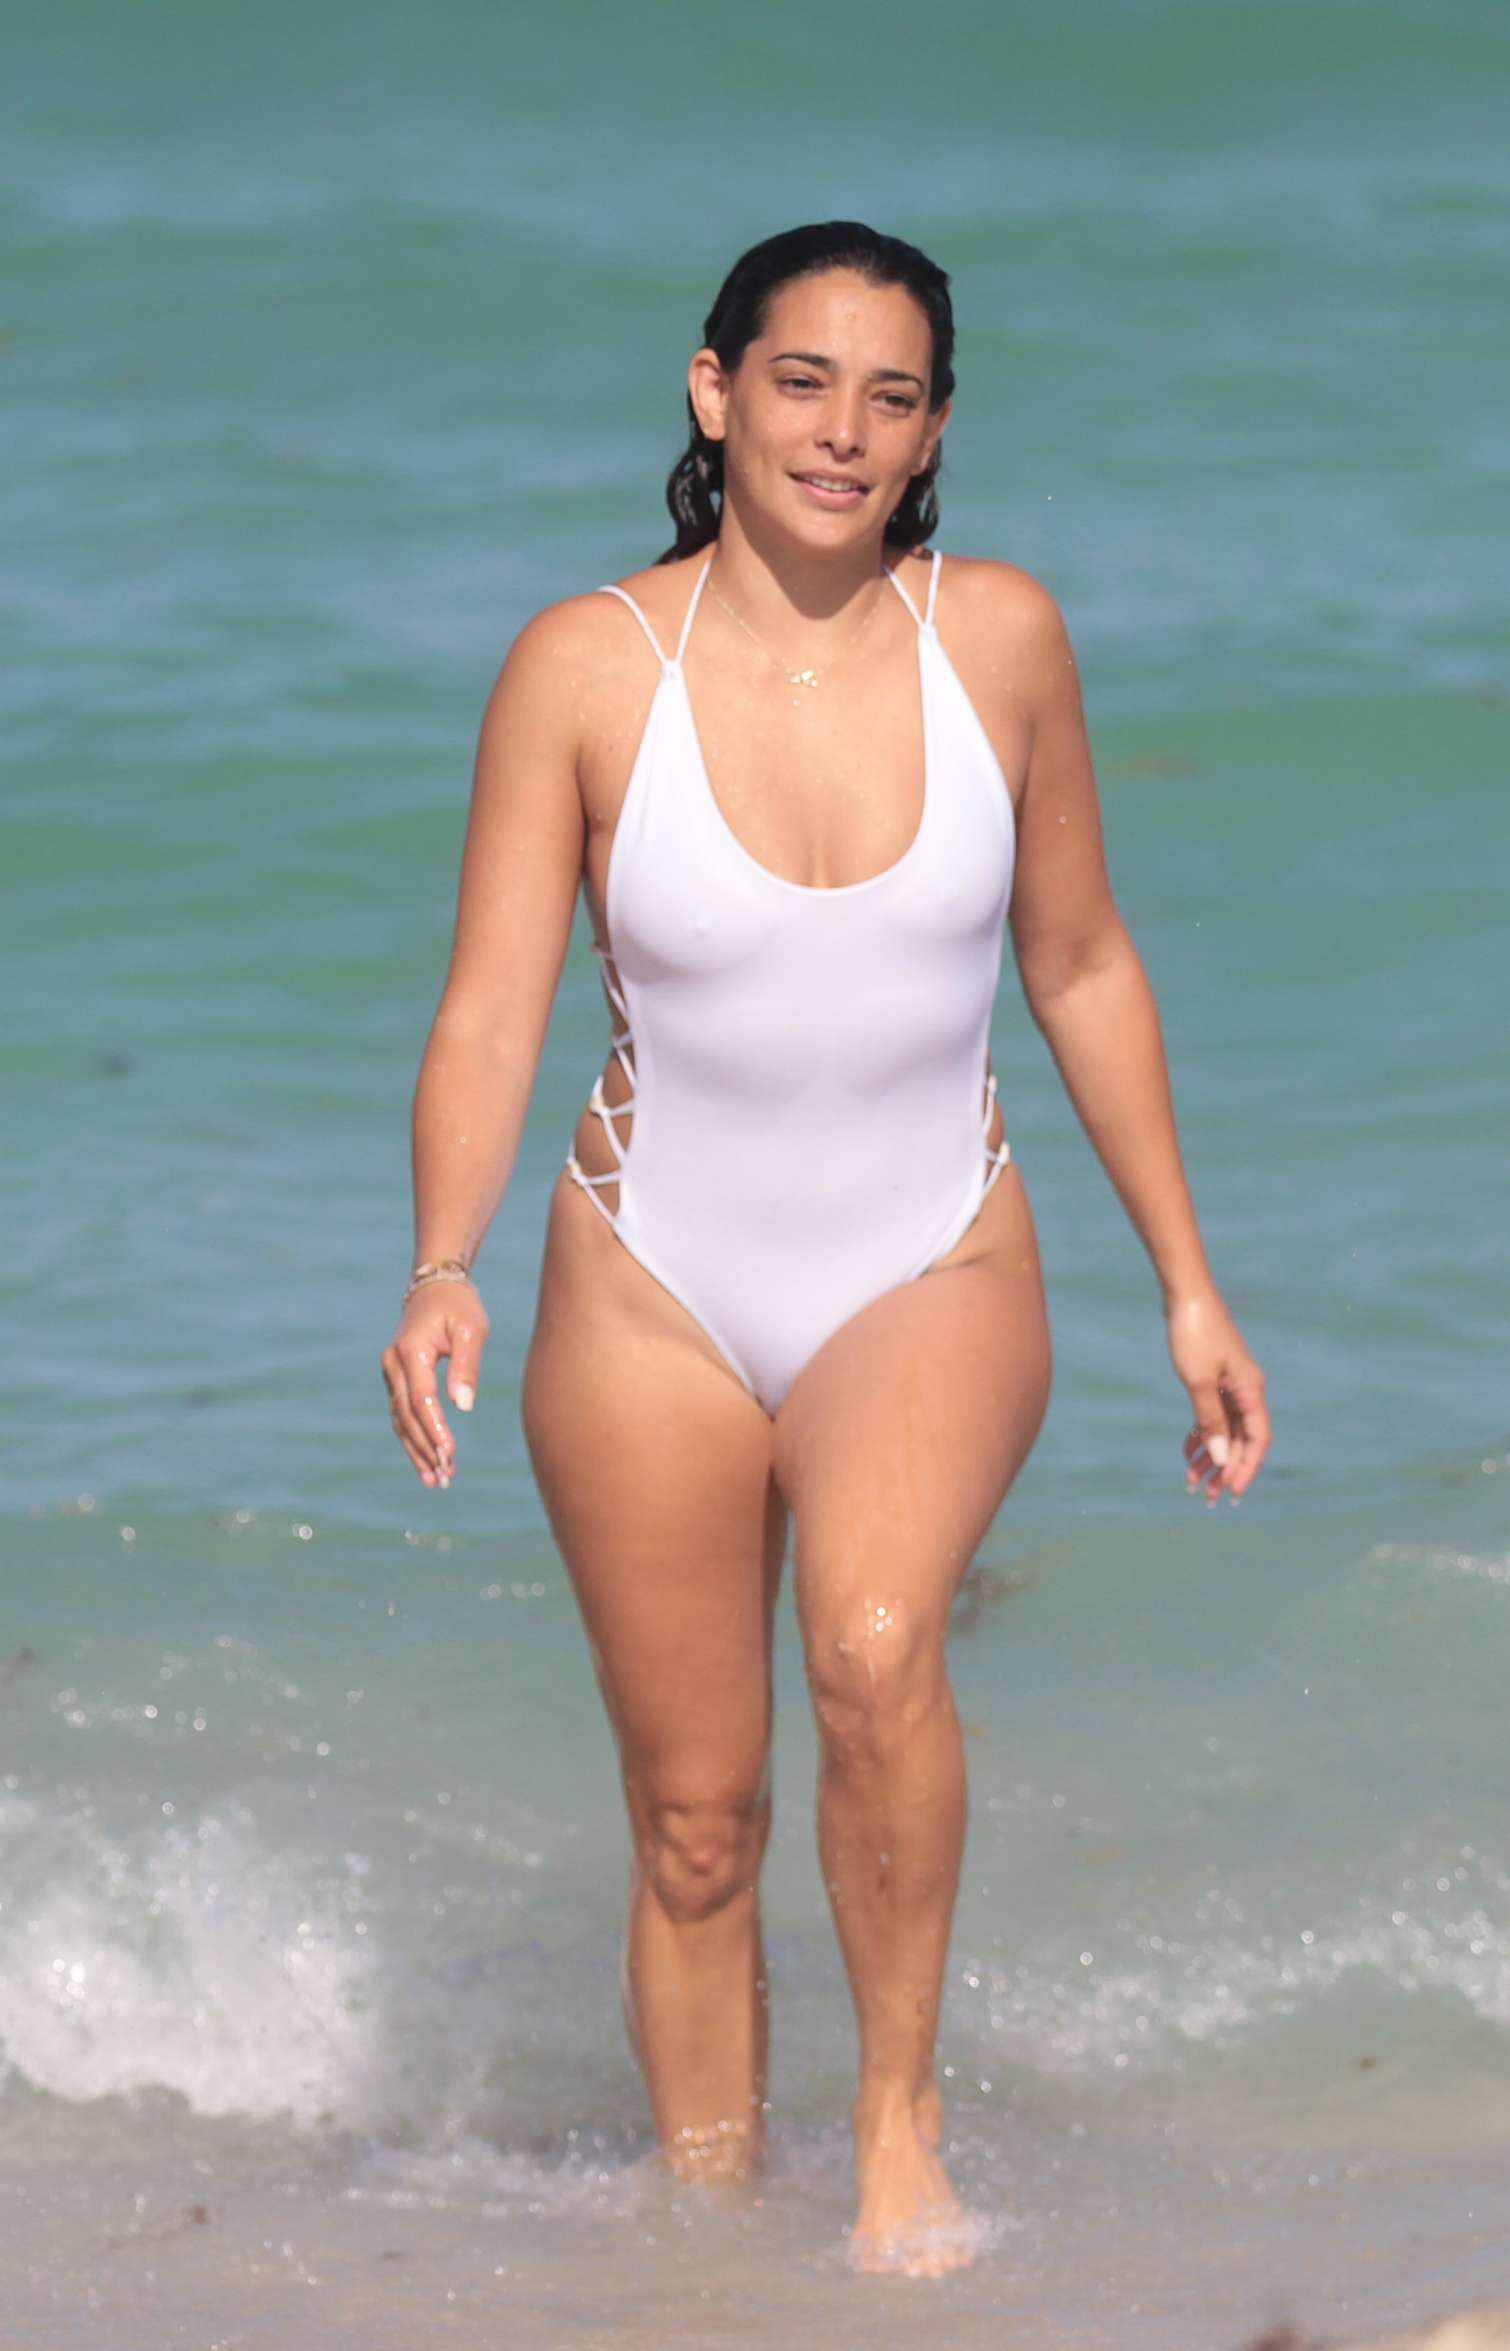 Natalie martinez in bikini miami beach florida - 2019 year